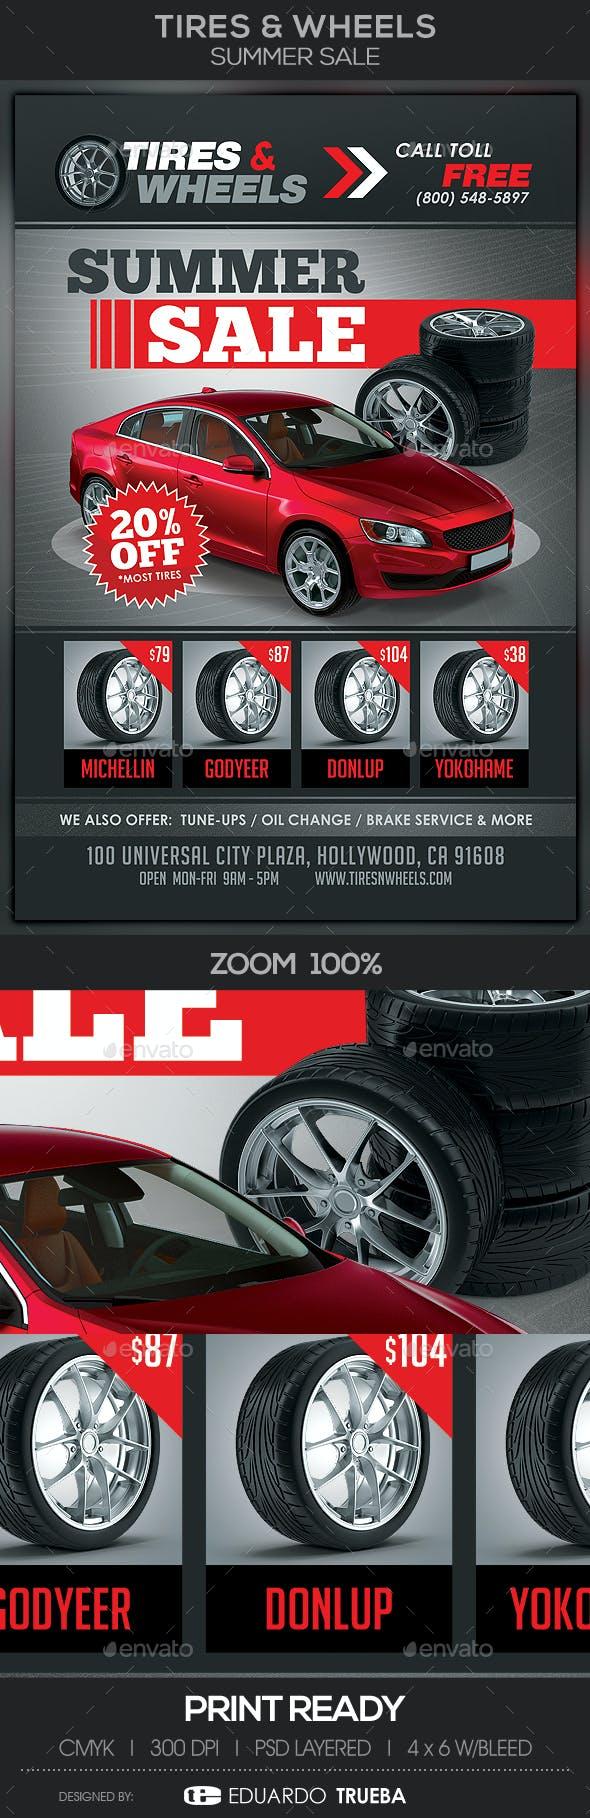 tires wheels summer sale flyer template by eduardotrueba